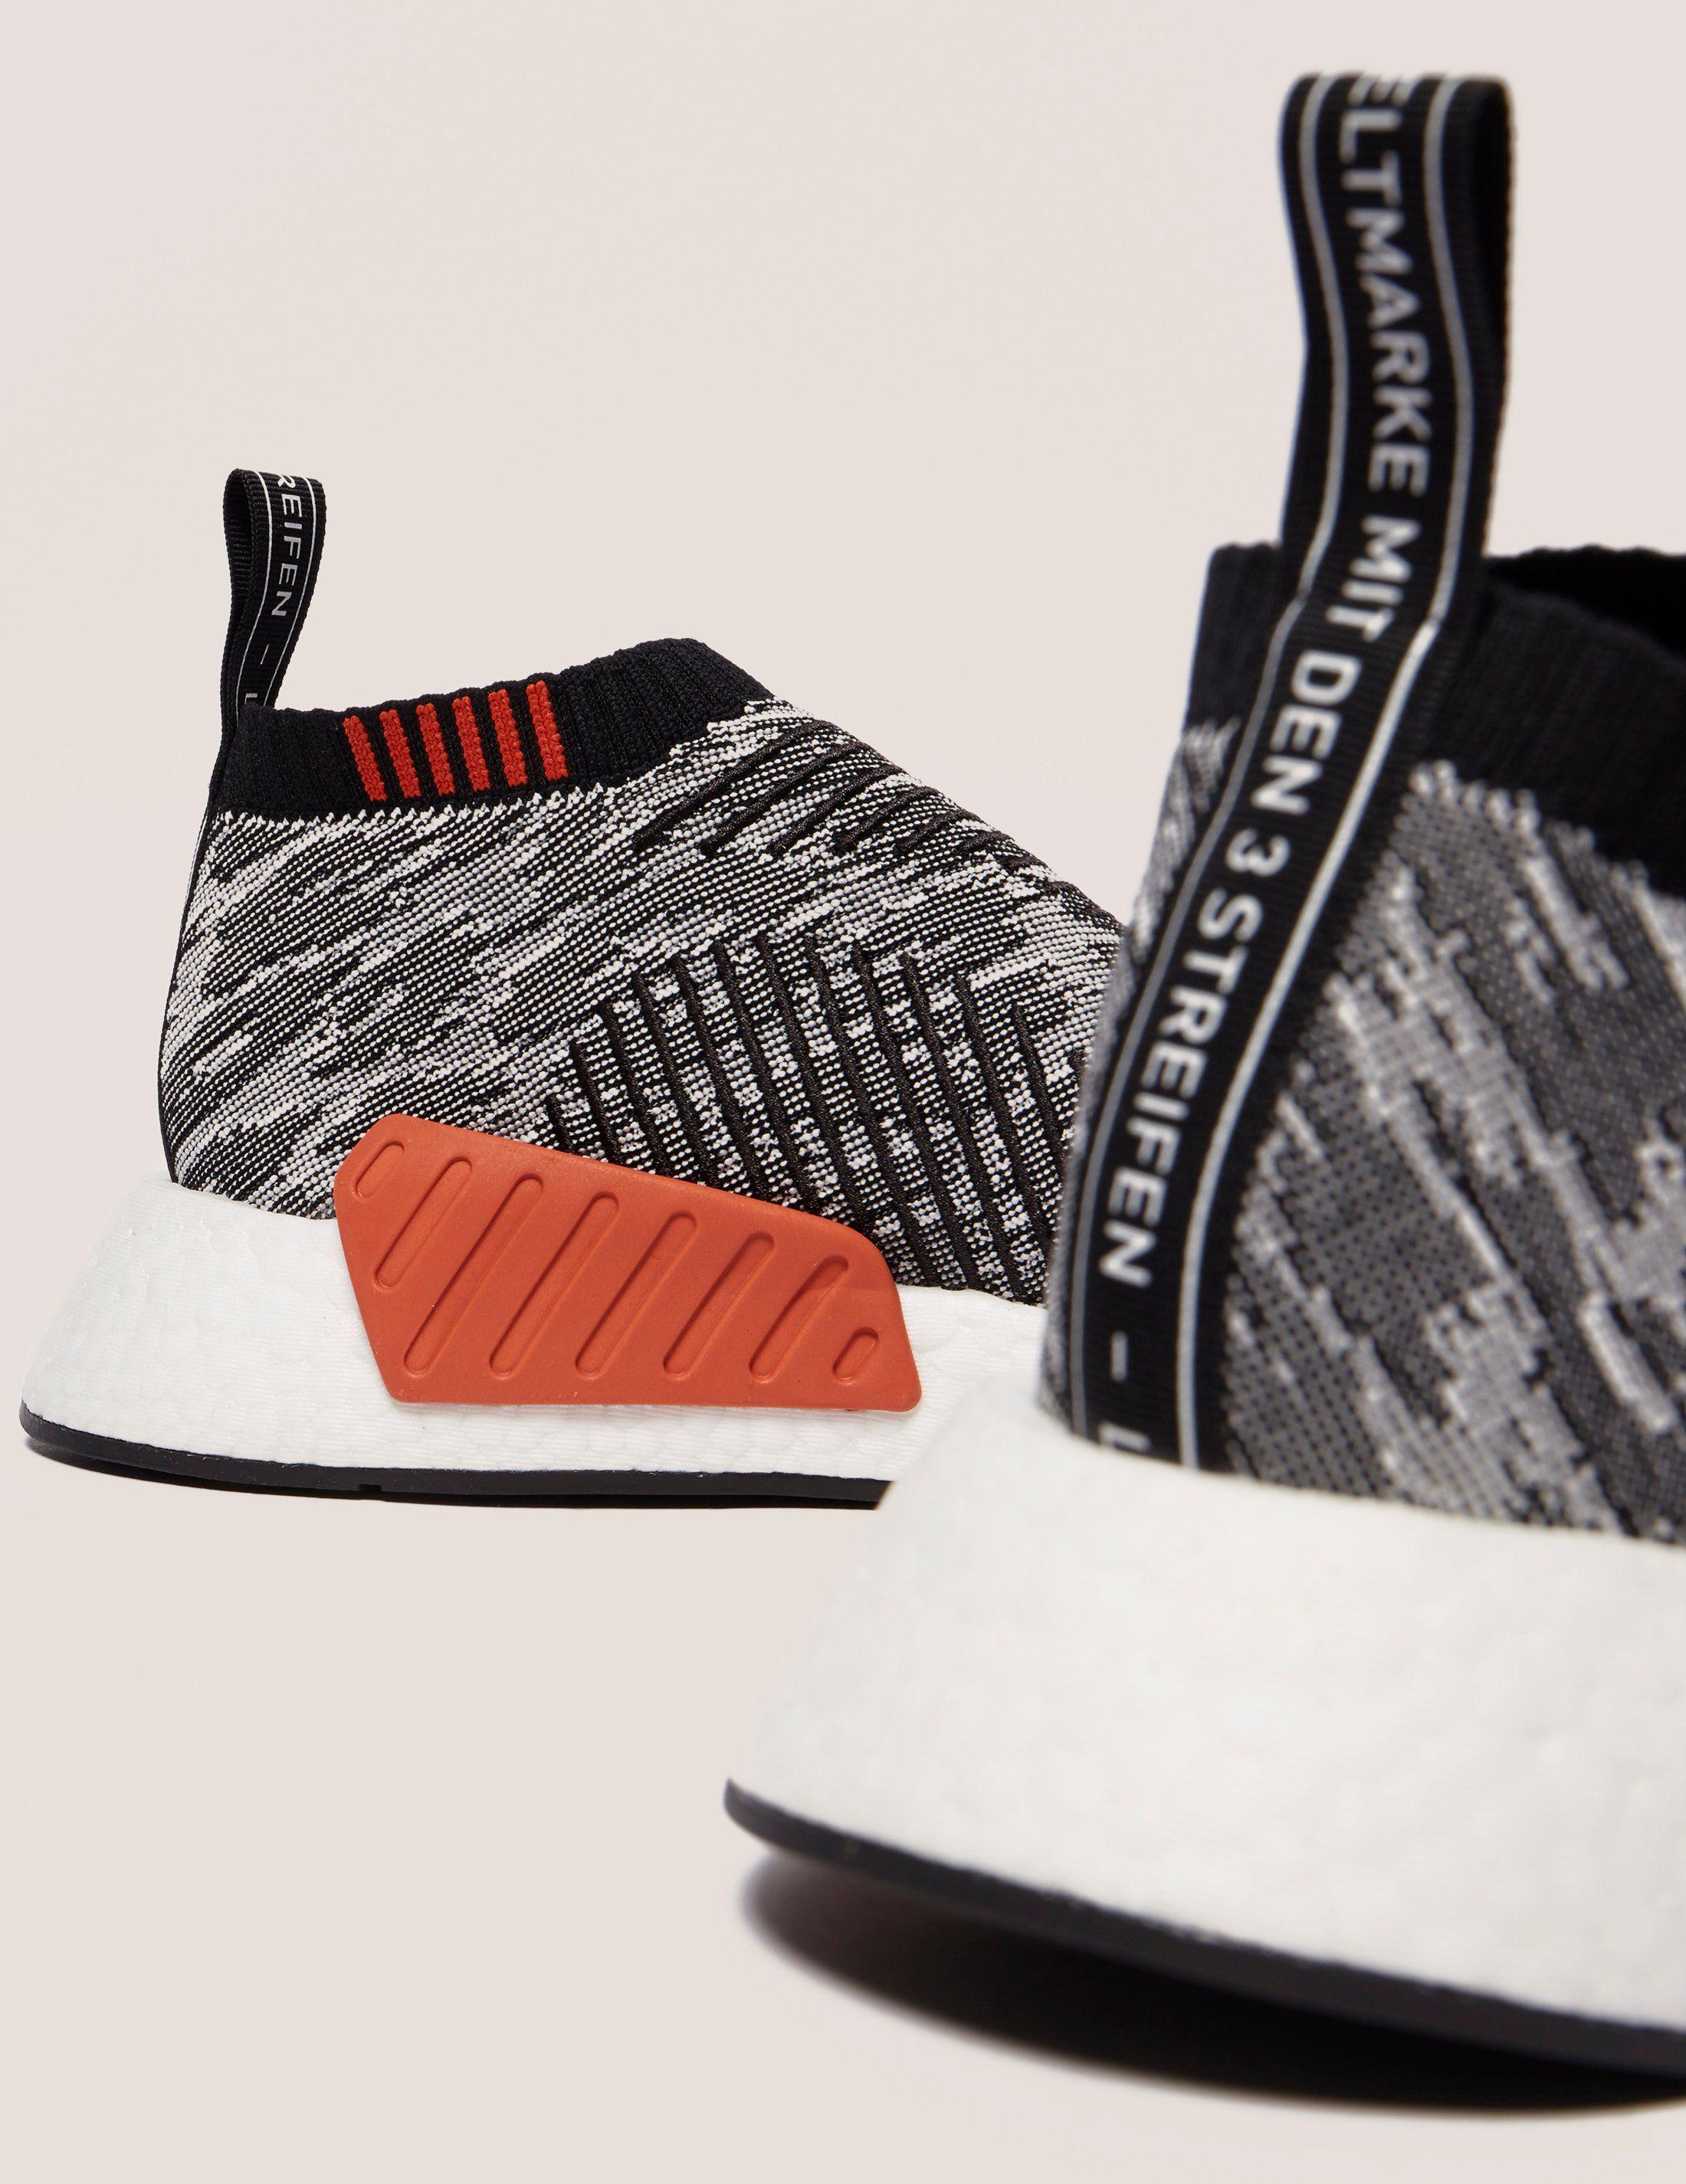 adidas Originals NMD CS2 Boost Primeknit